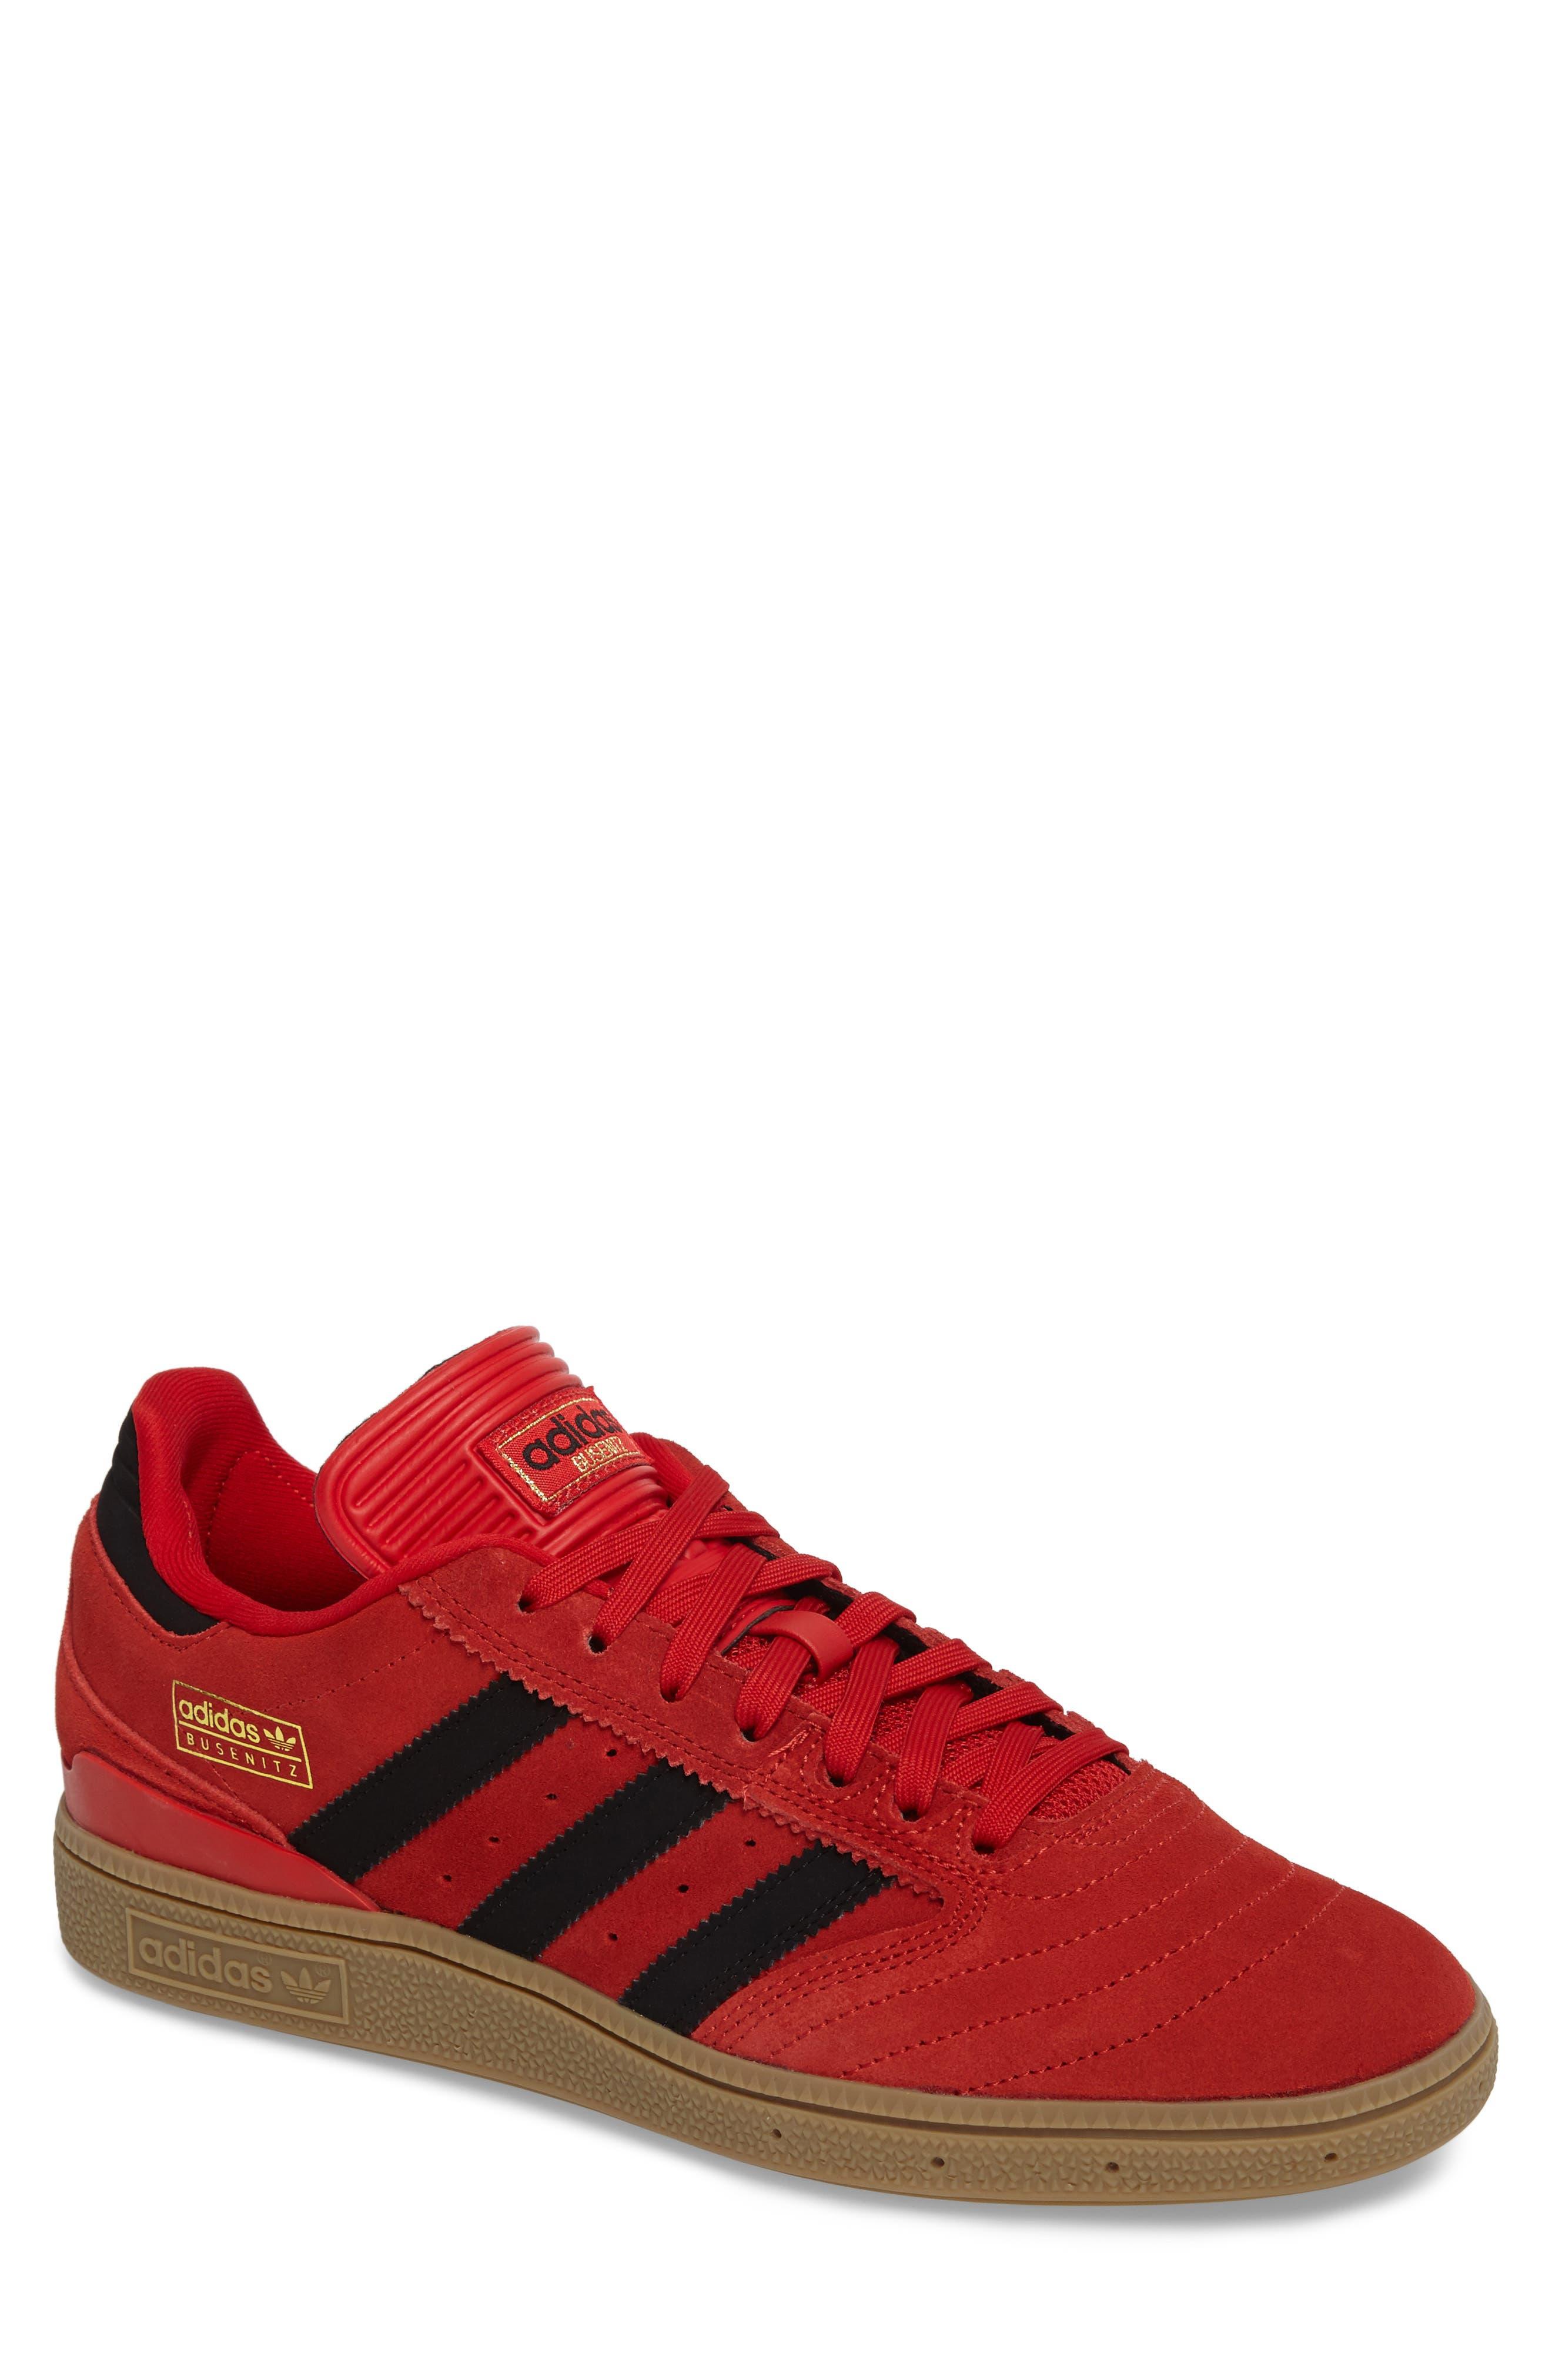 Busenitz Sneaker,                         Main,                         color, Scarlet/ Core Black/ Gum4